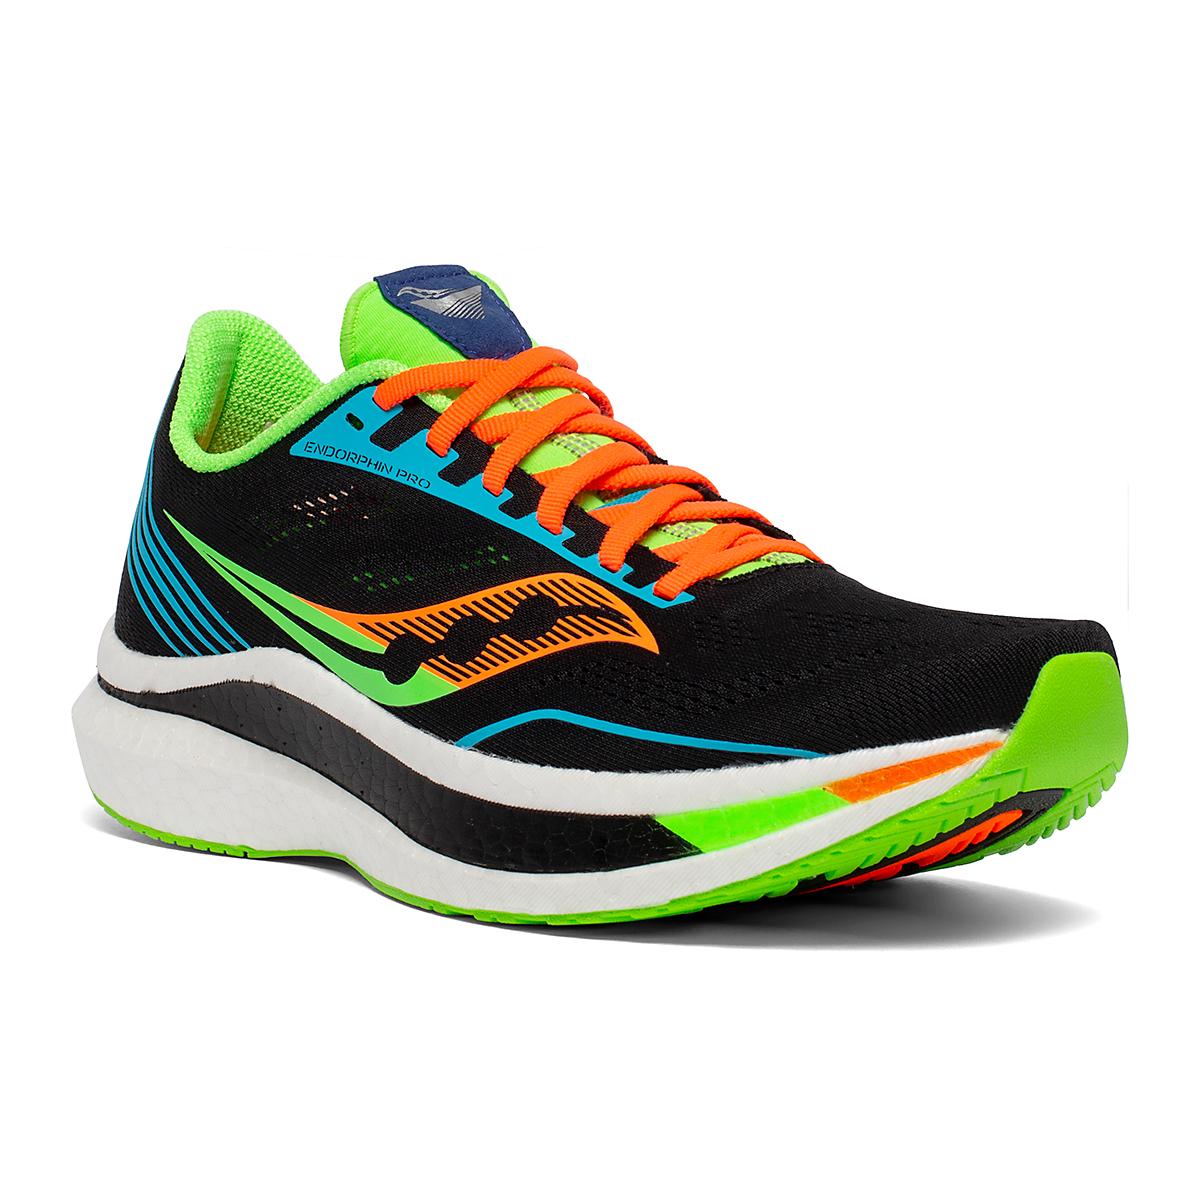 Men's Saucony Endorphin Pro Running Shoe - Color: Future/Black - Size: 7 - Width: Regular, Future/Black, large, image 1